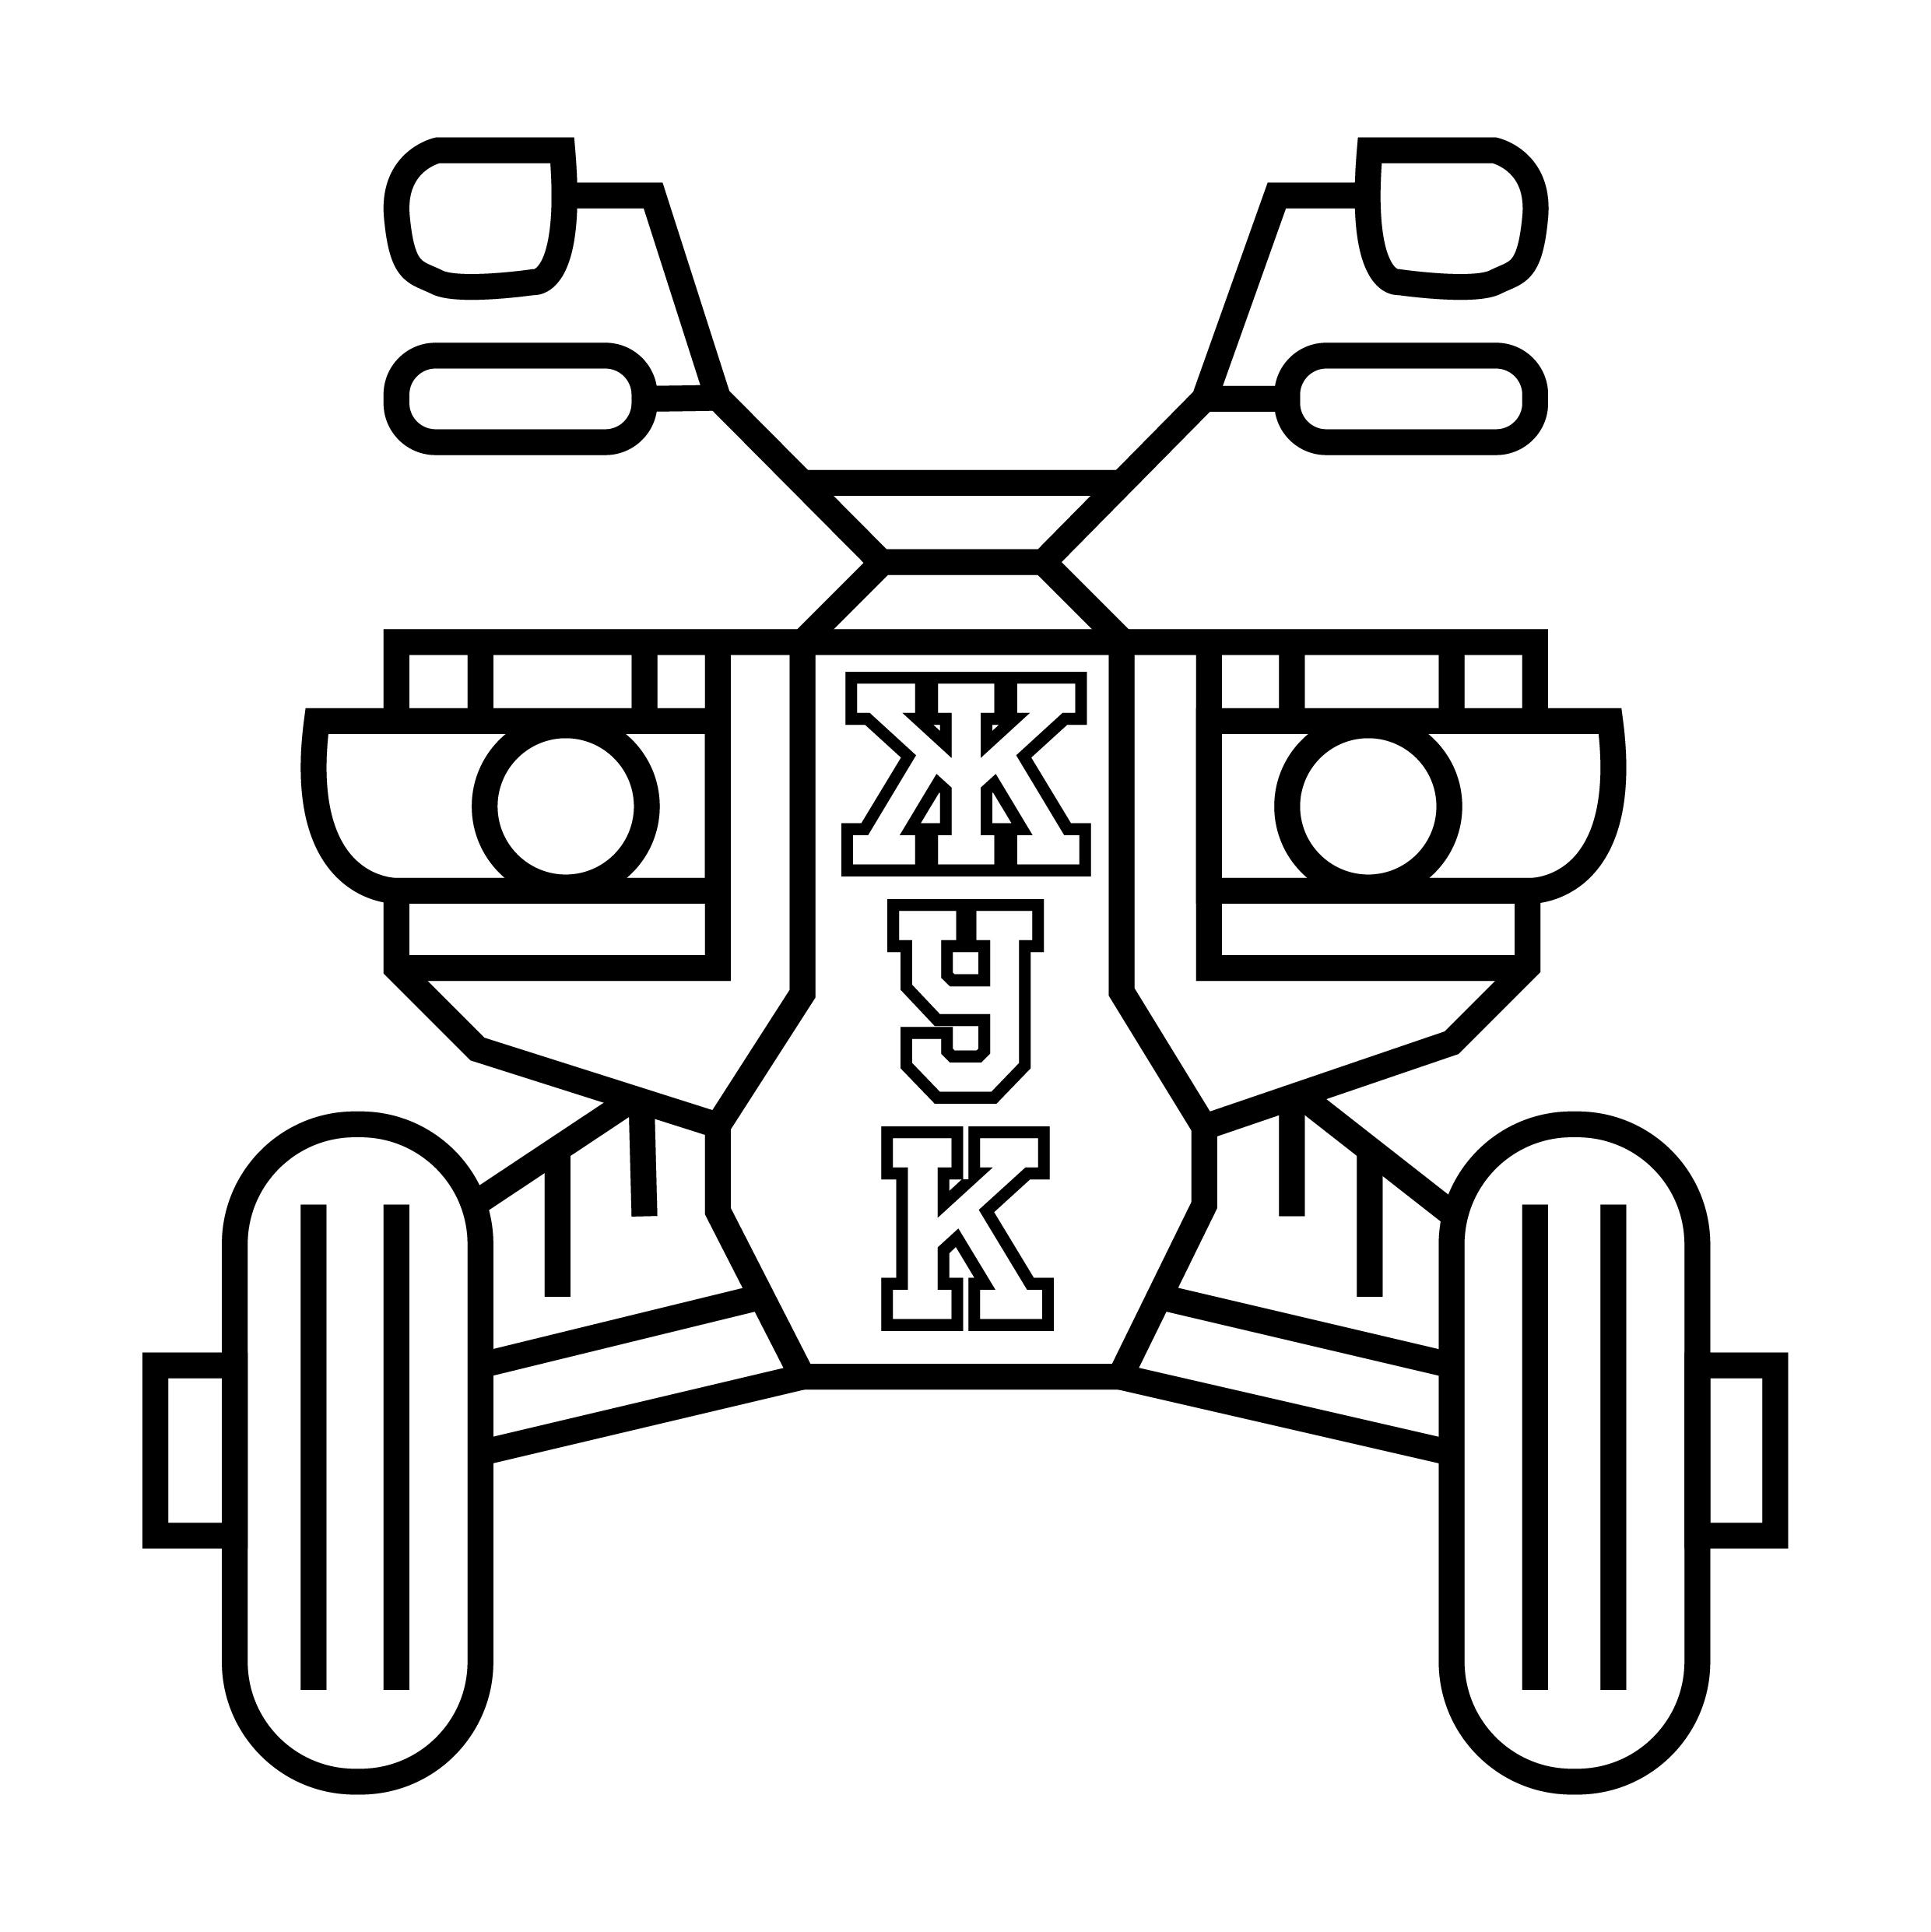 Нужен логотип (эмблема) для самодельного квадроцикла фото f_9385afd686011beb.jpg